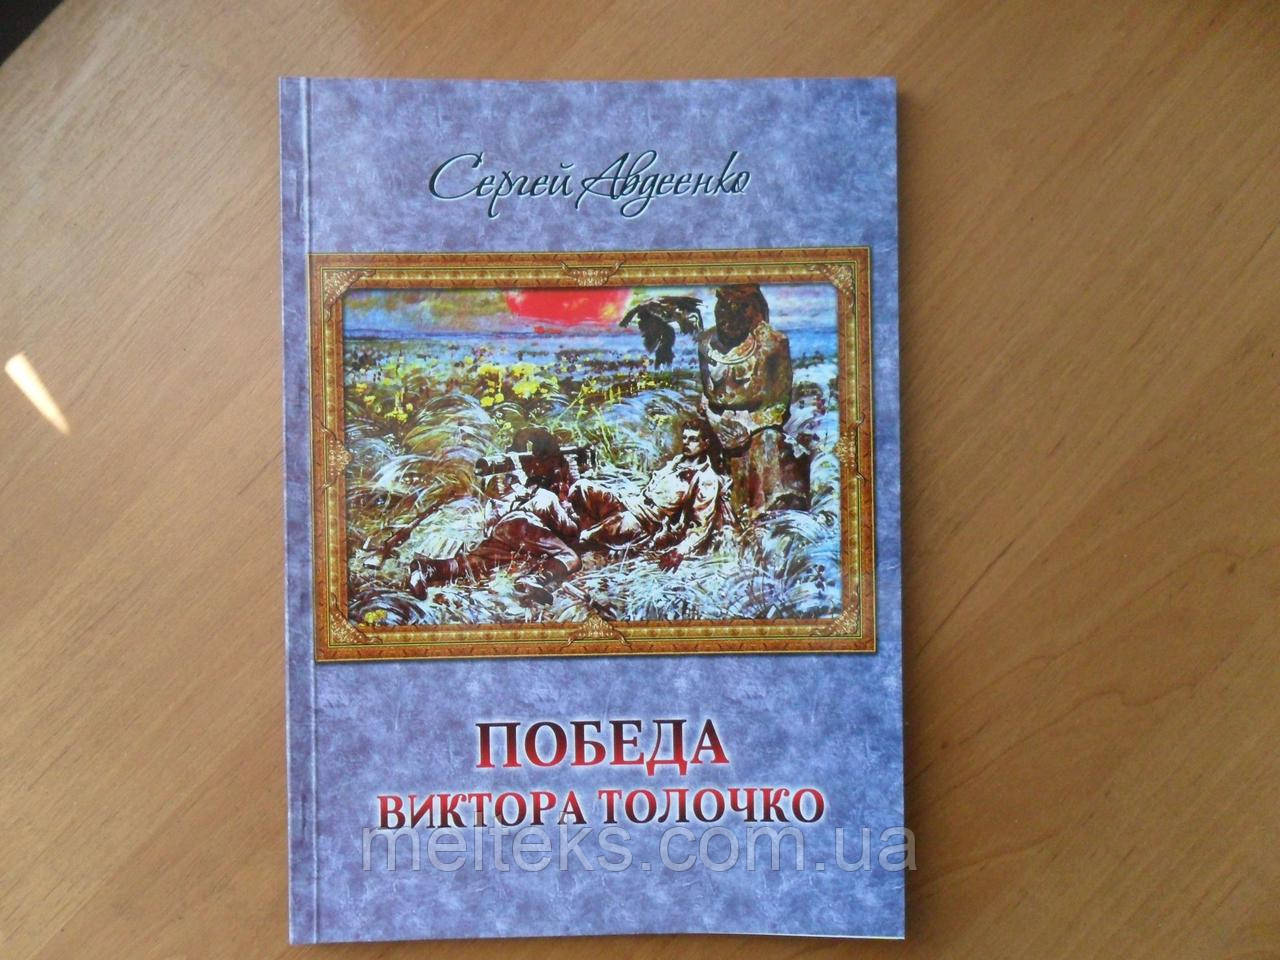 Победа Виктора Толочко (книга Сергея Авдеенко)